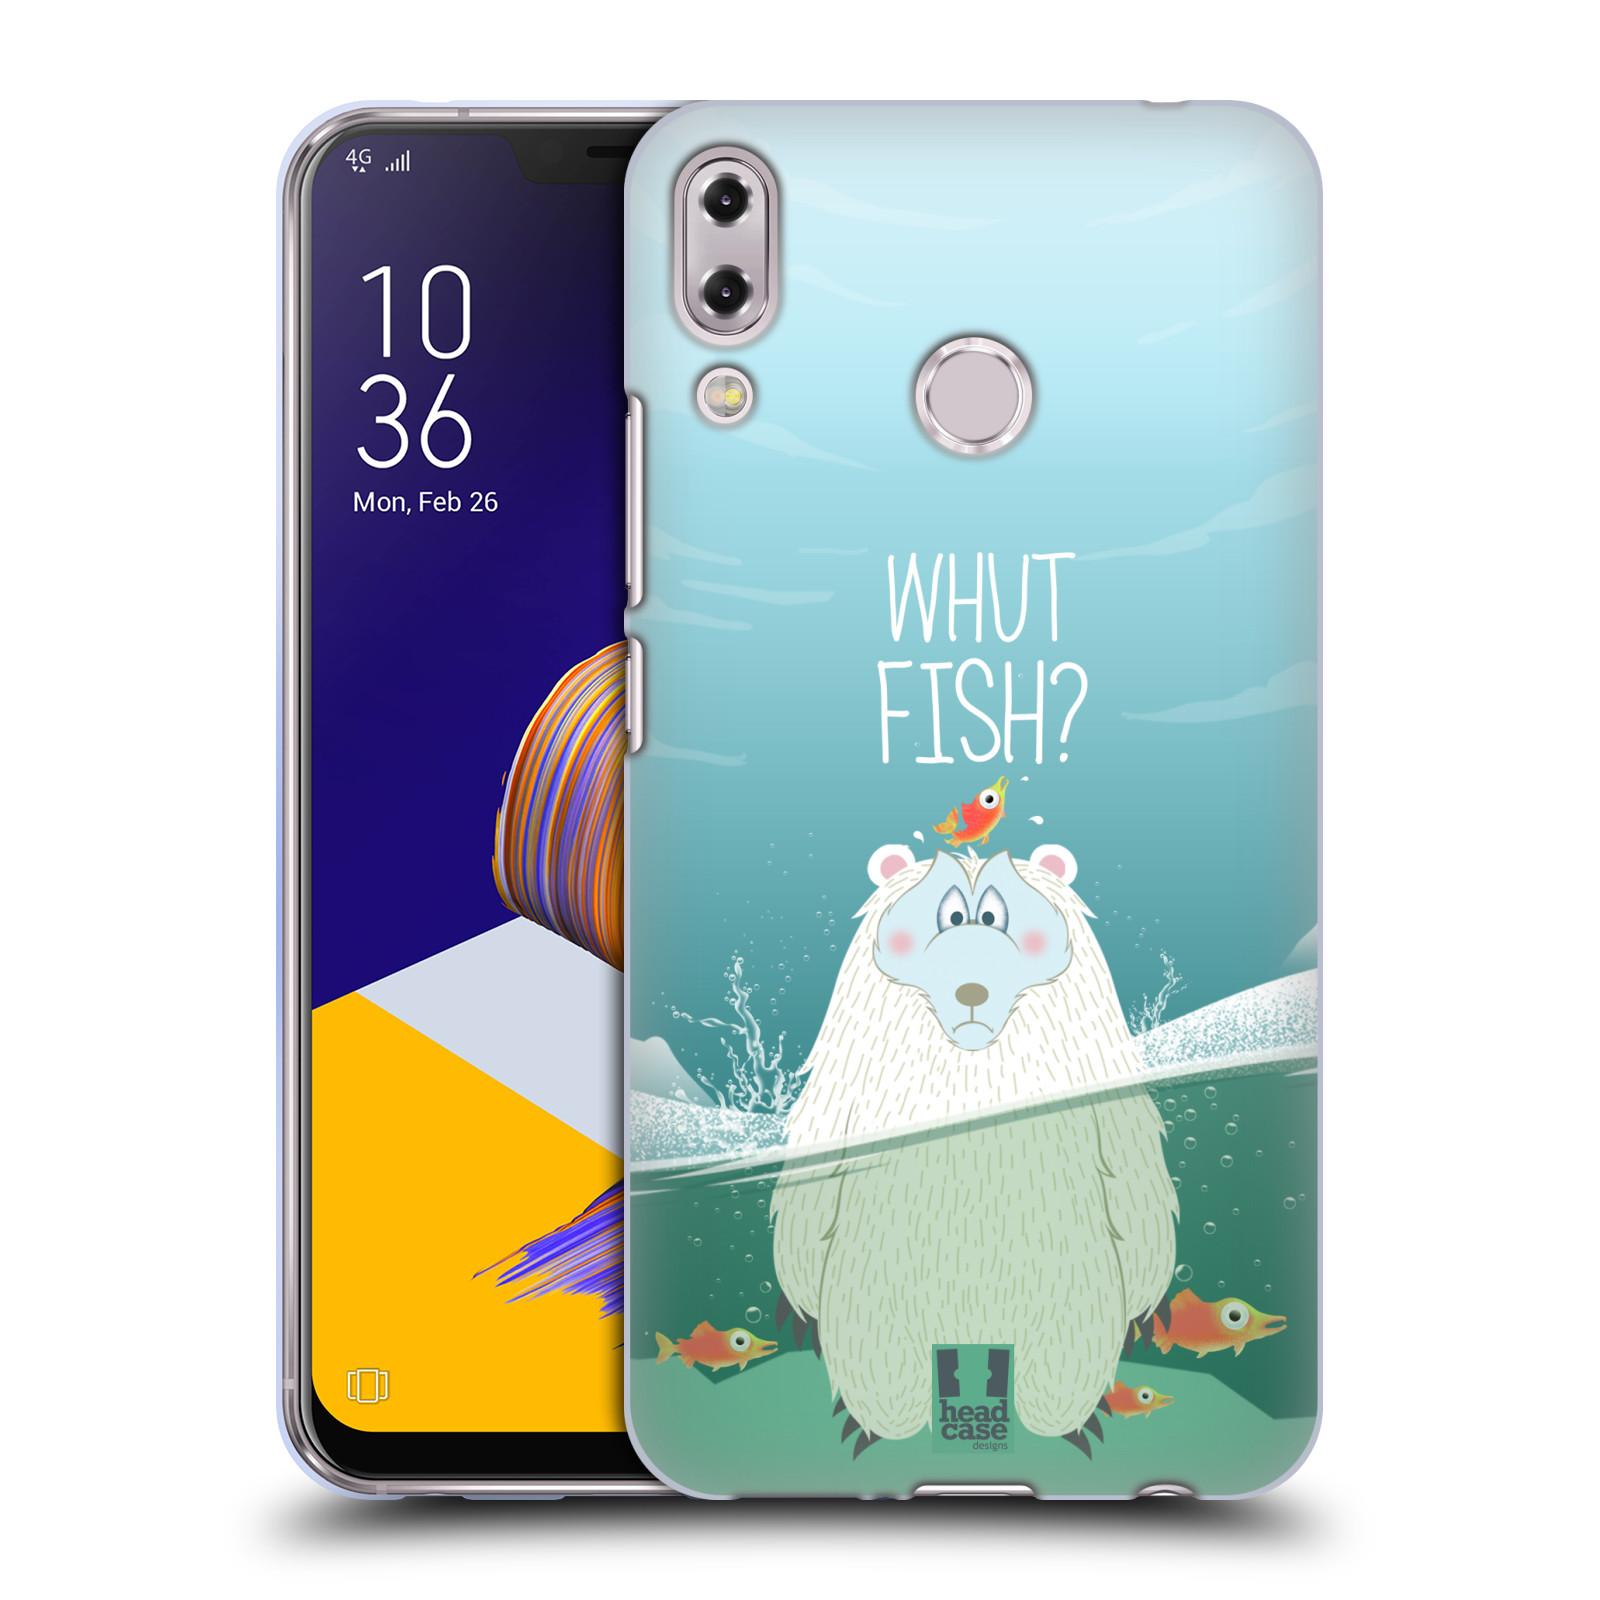 Silikonové pouzdro na mobil Asus ZenFone 5 ZE620KL - Head Case - Medvěd Whut Fish?